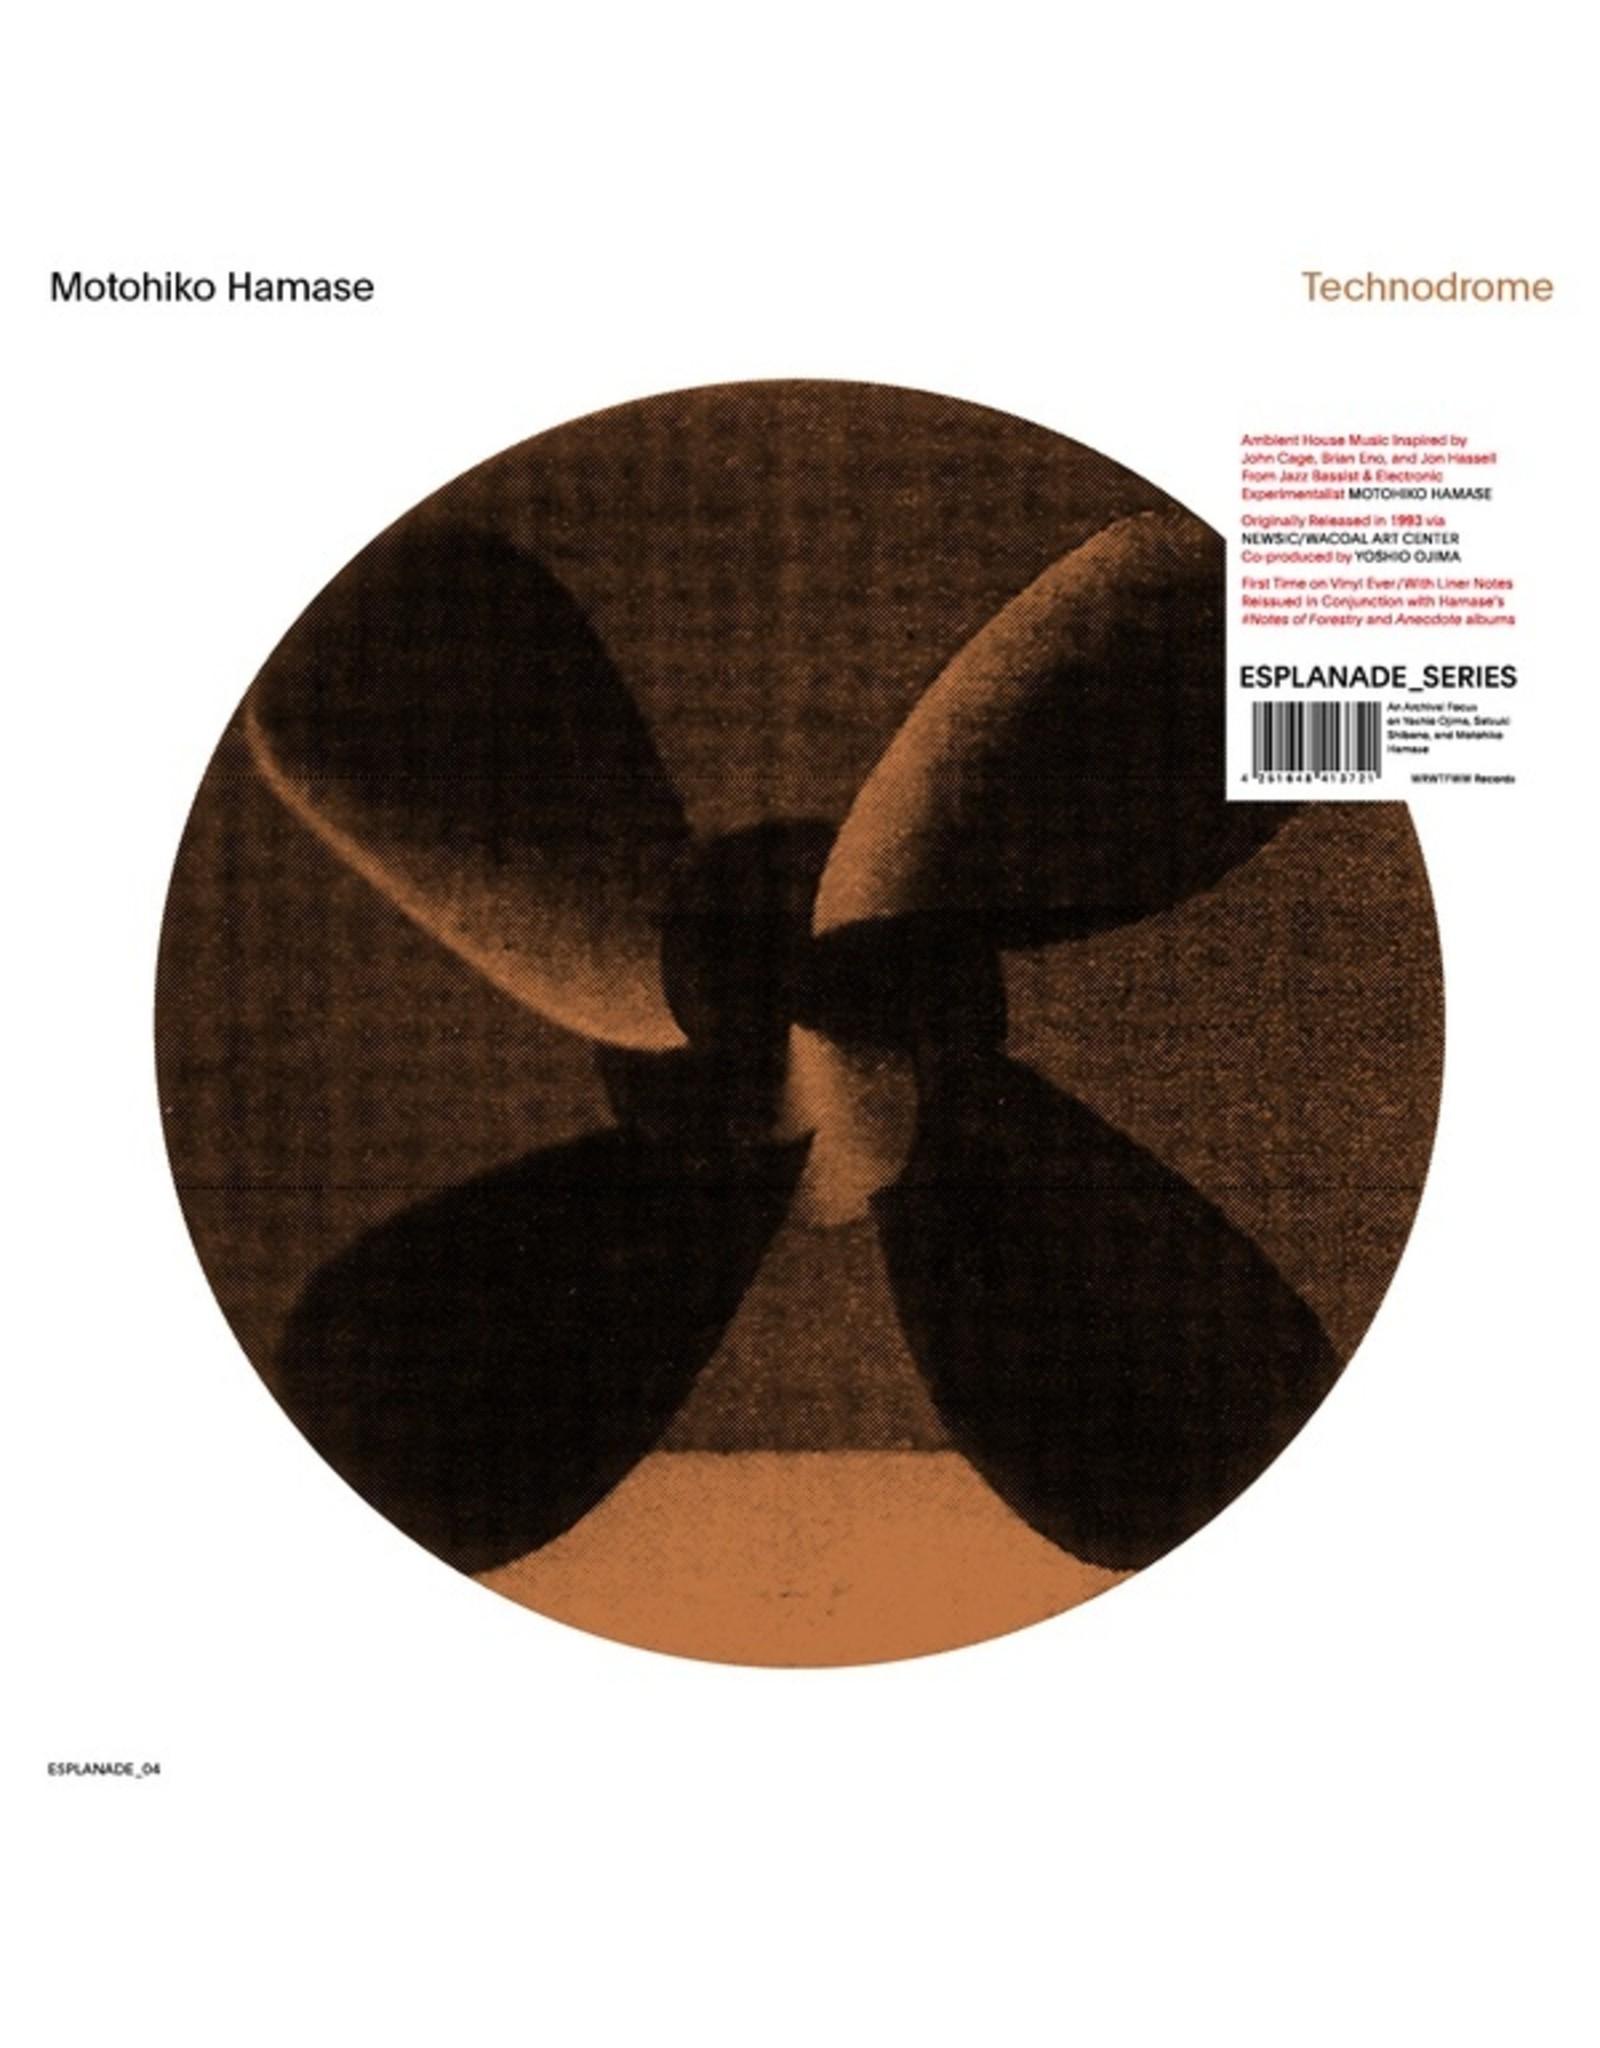 New Vinyl Motohiko Hamase - Technodrome LP